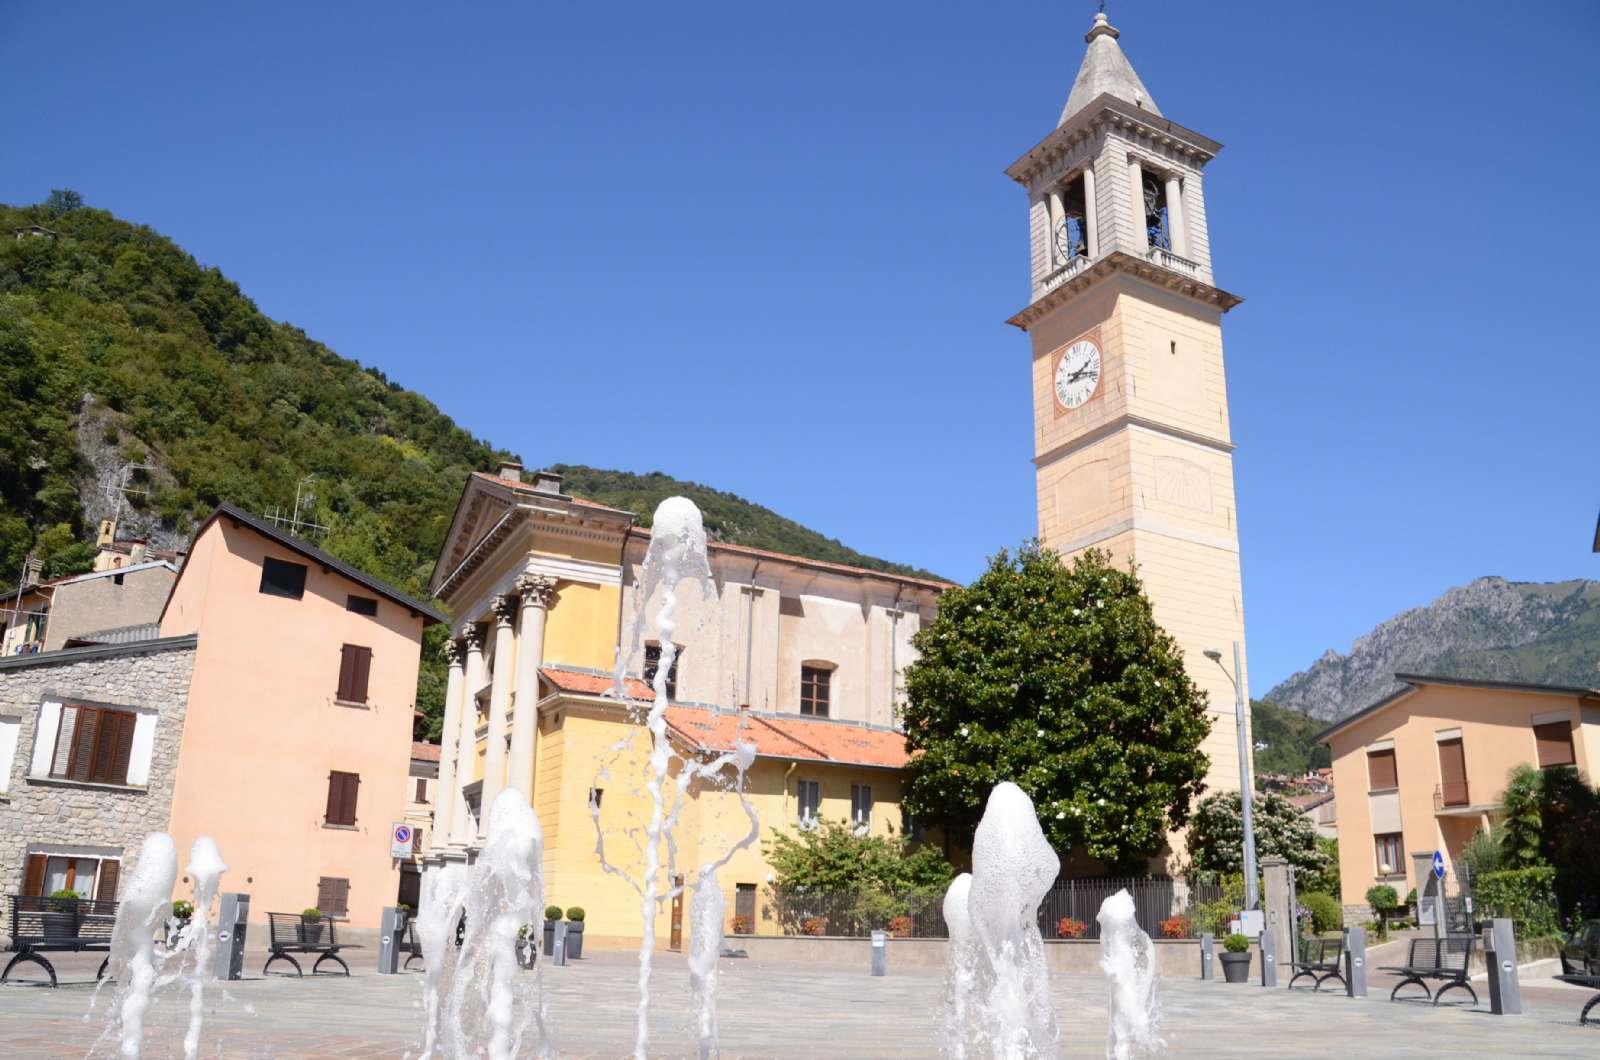 La ville de Porlezza